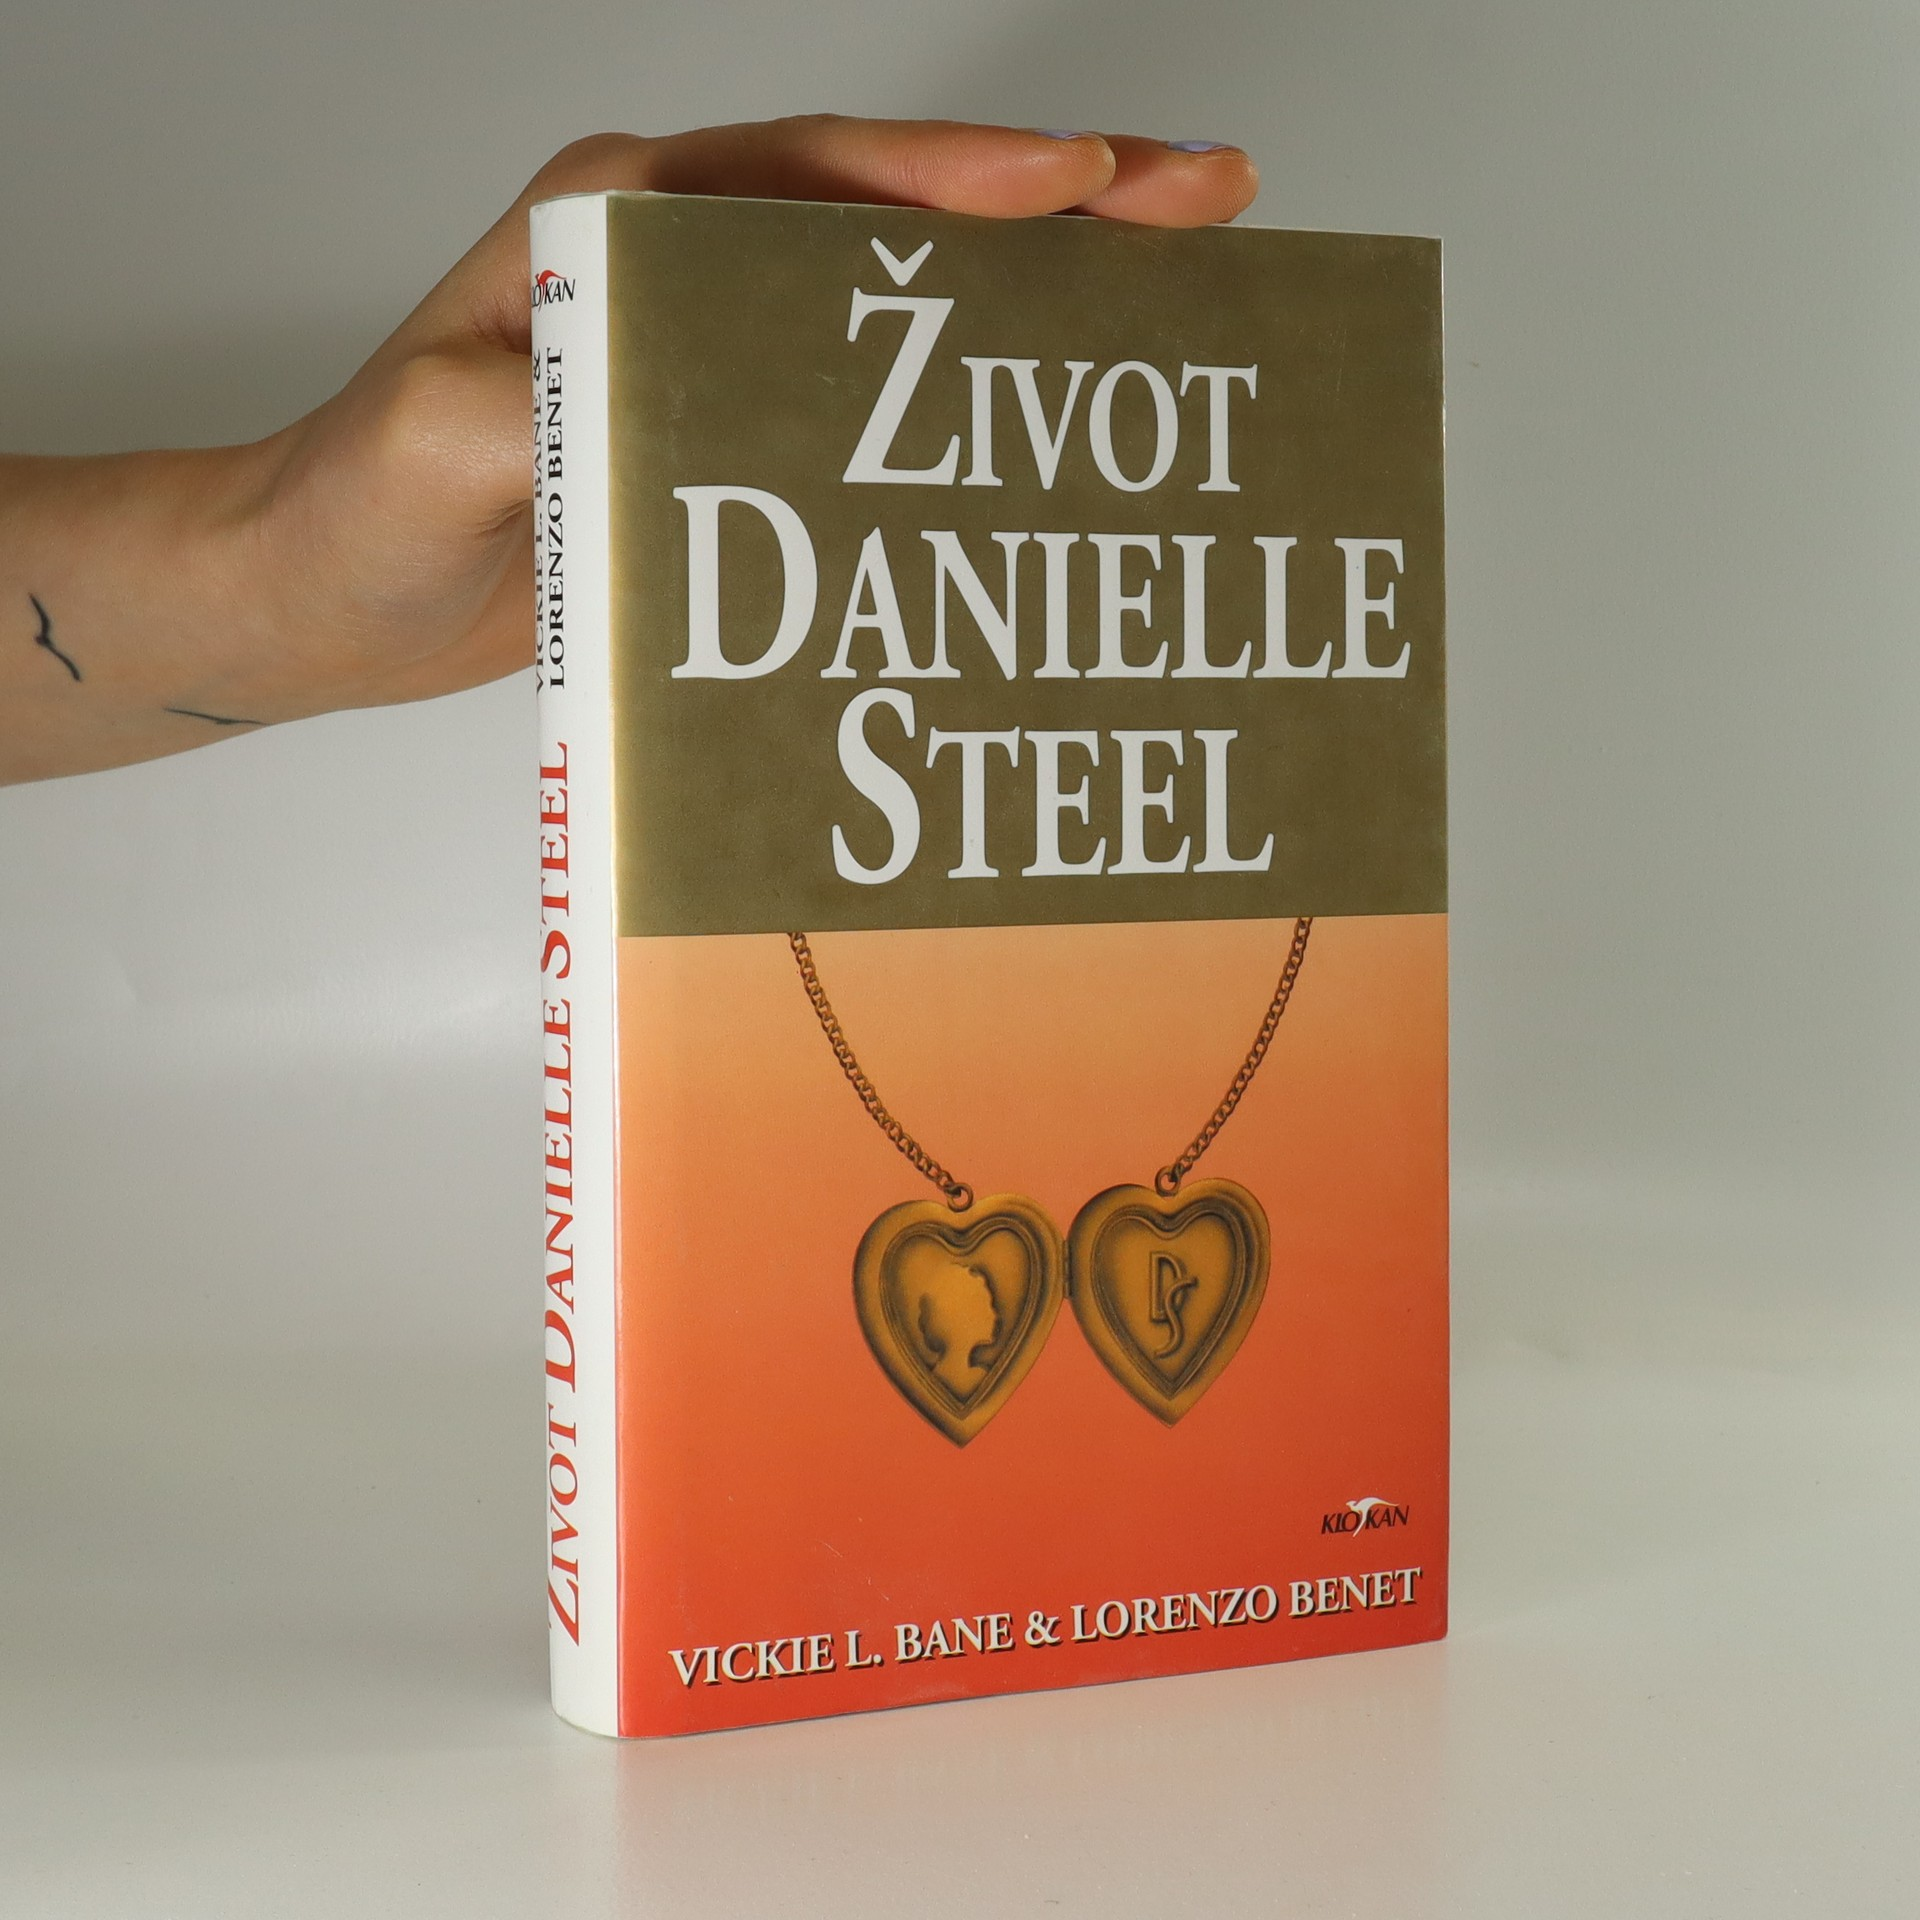 antikvární kniha Život Danielle Steel, 1999